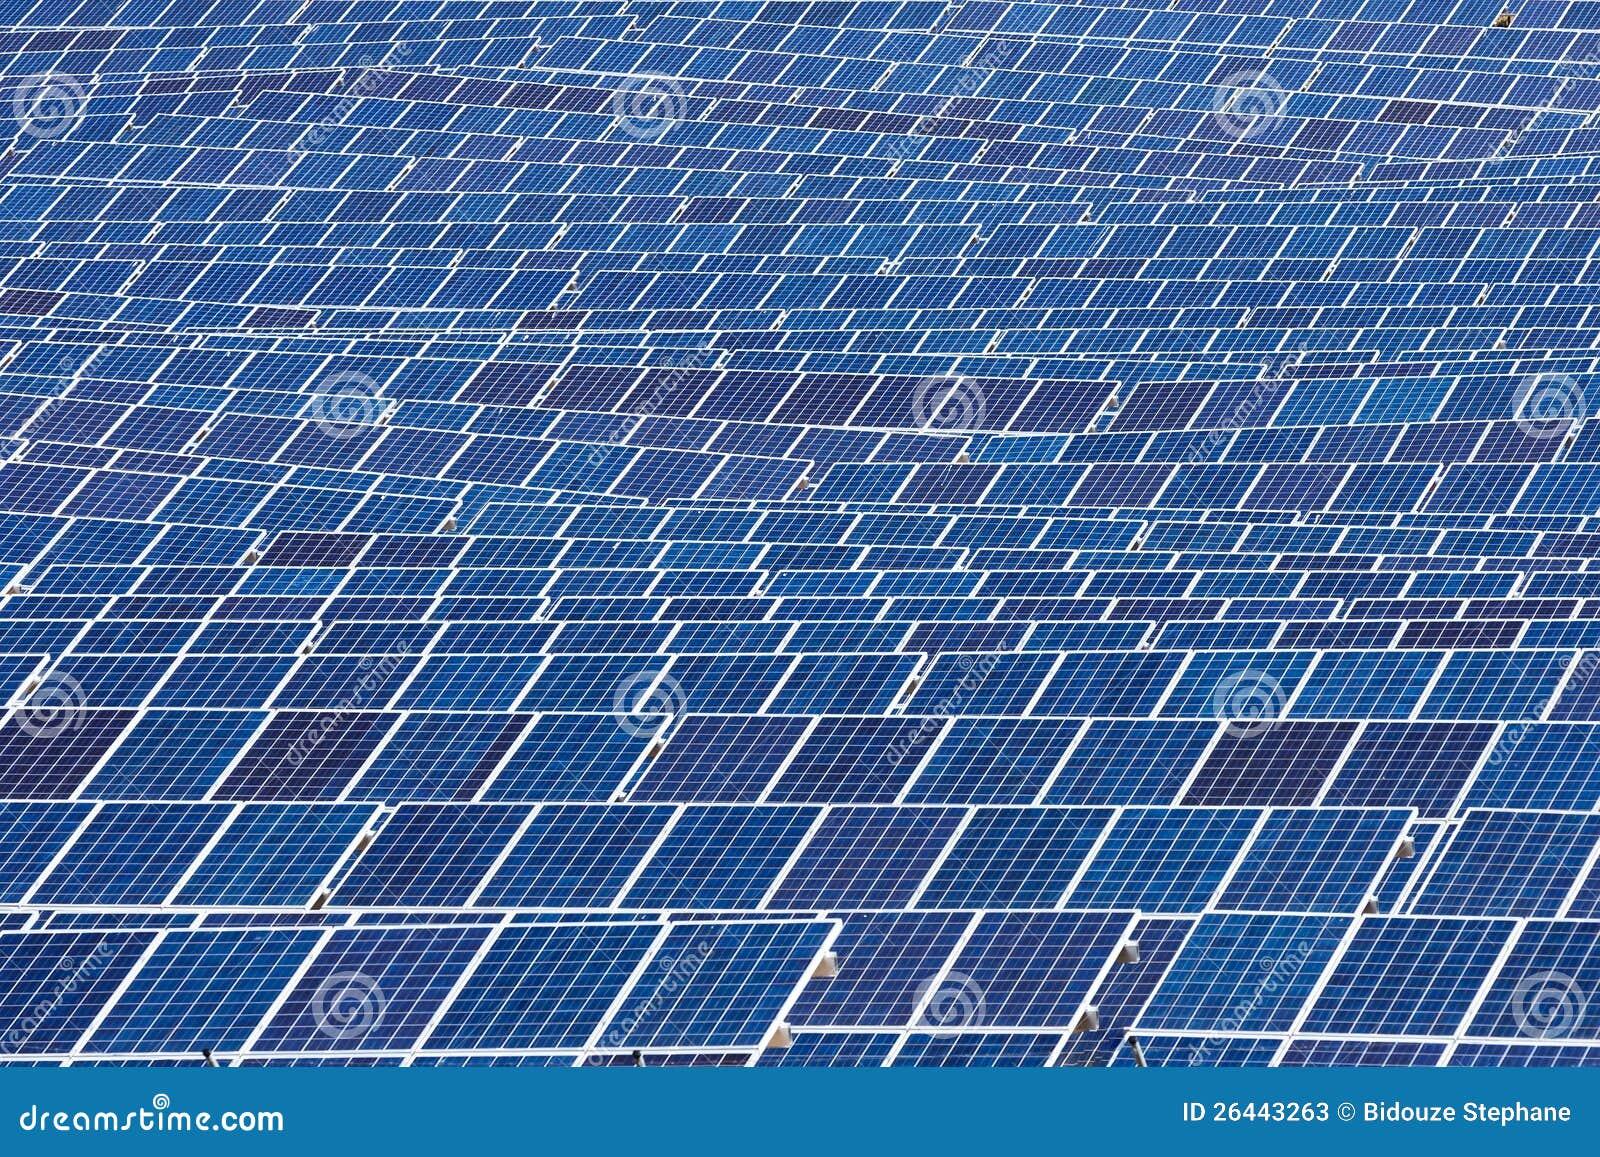 solar panel background - photo #30